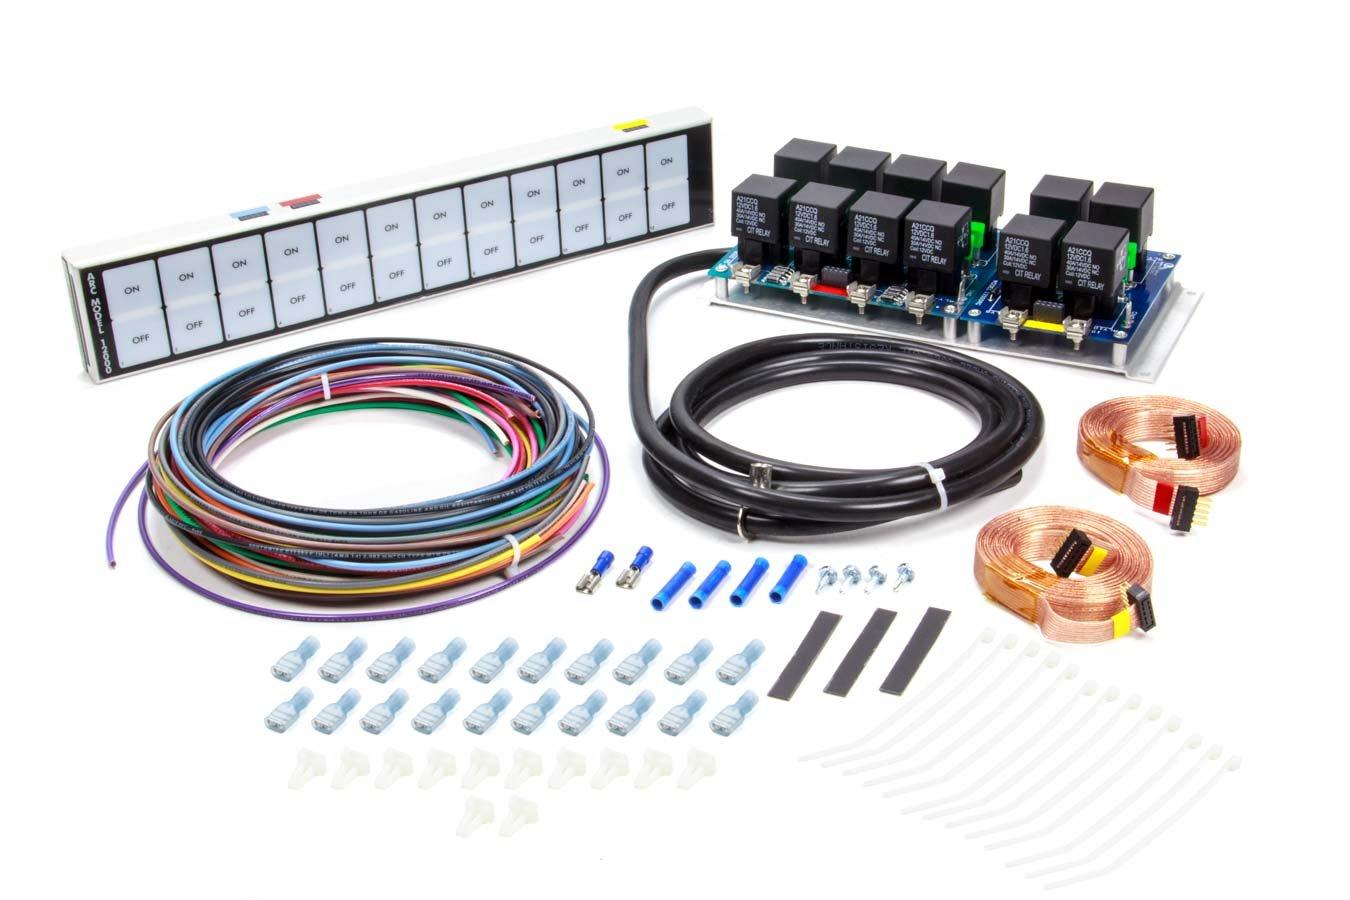 Auto-Rod Controls 12000R Overhead Control Module by Auto-Rod Controls